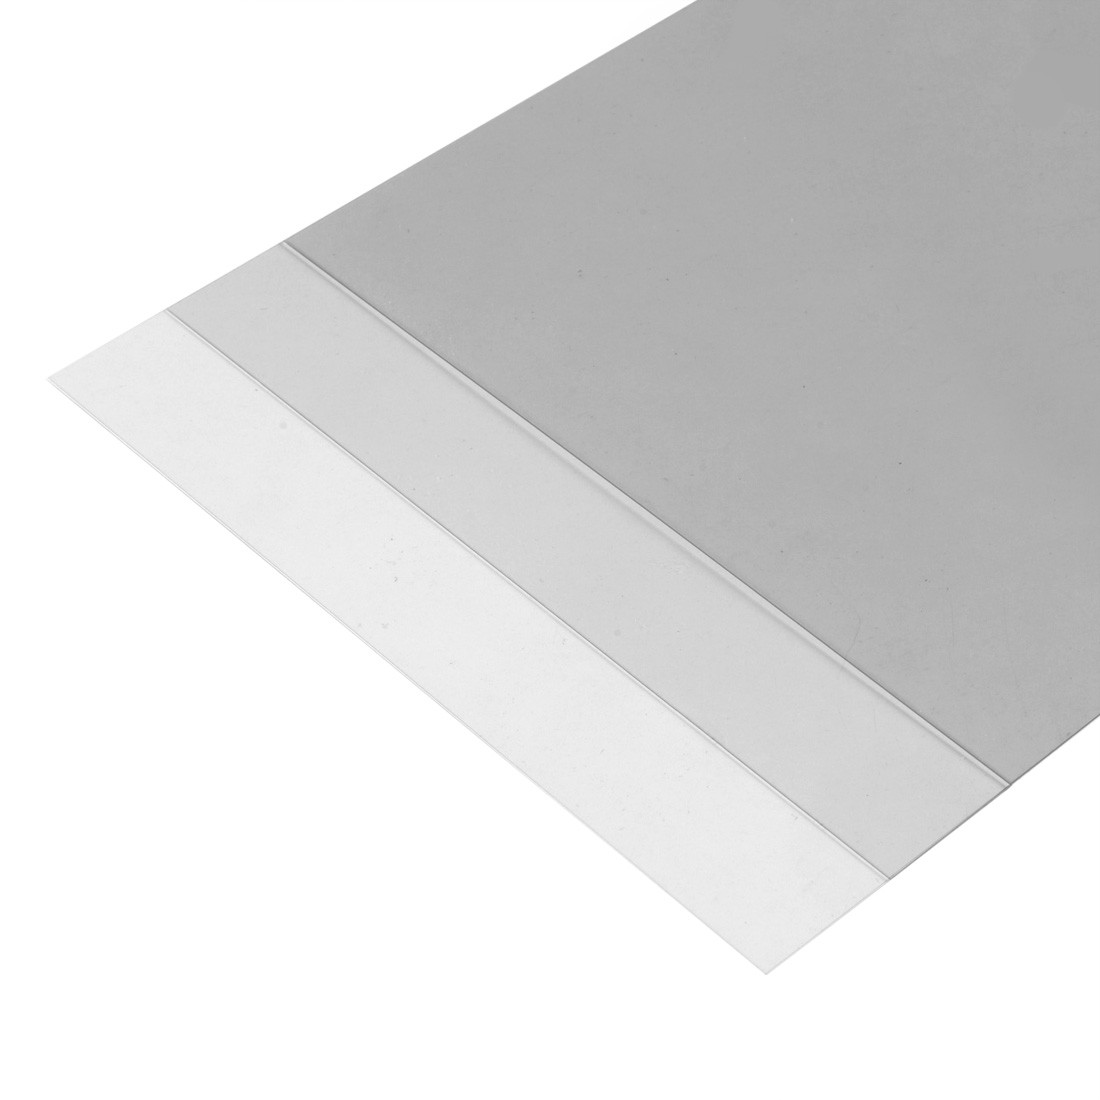 PVC clear sheet mm.194x320 - mm. 0,40